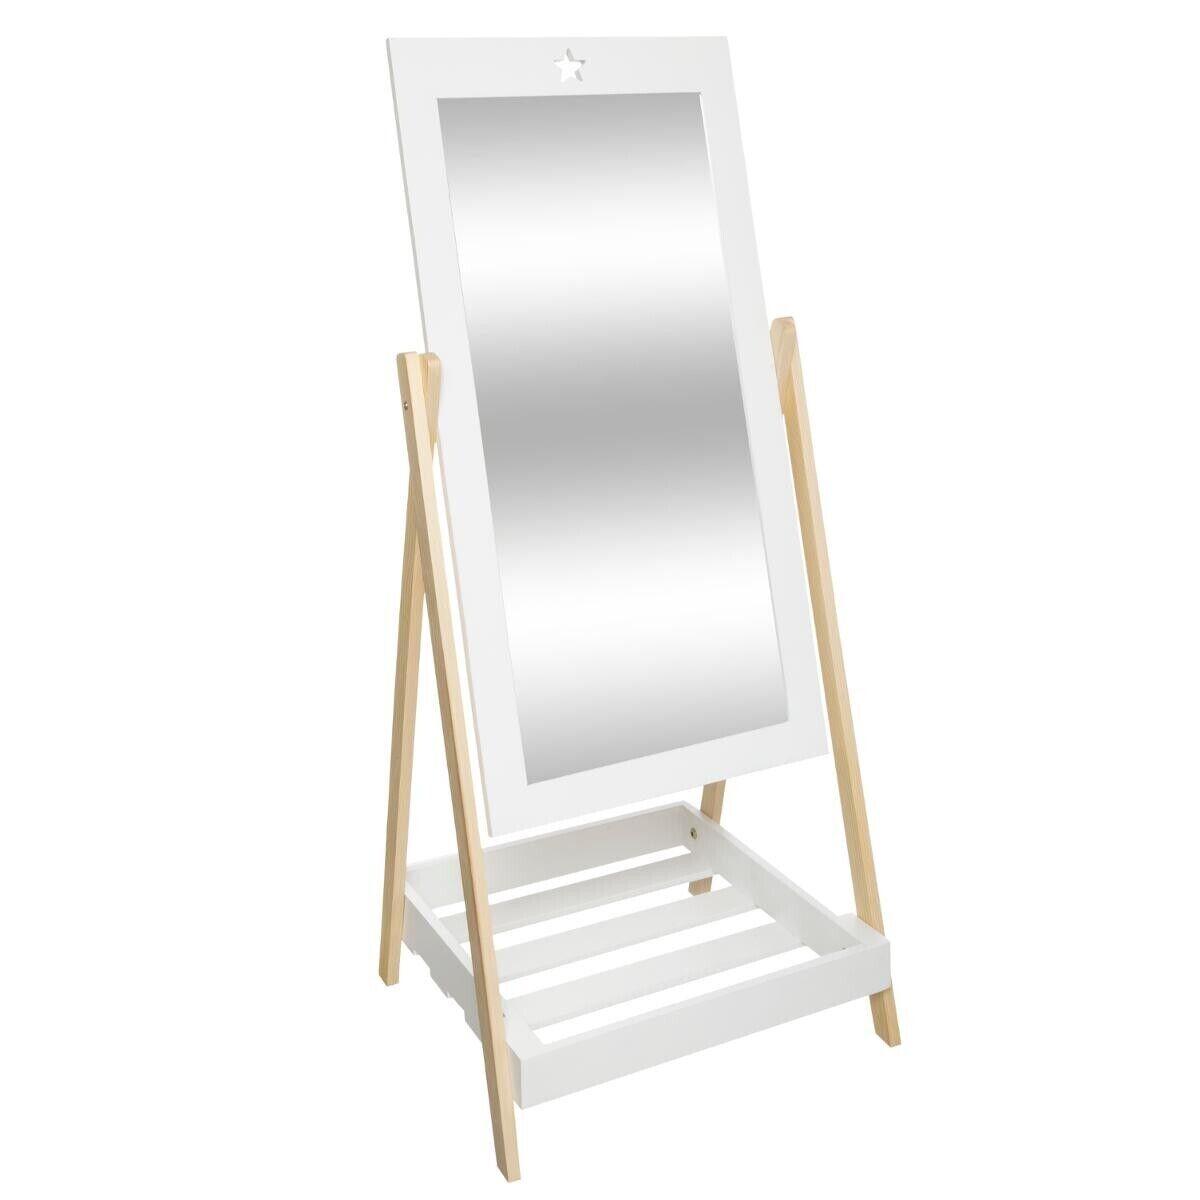 Atmosphera Miroir sur pied H102 cm